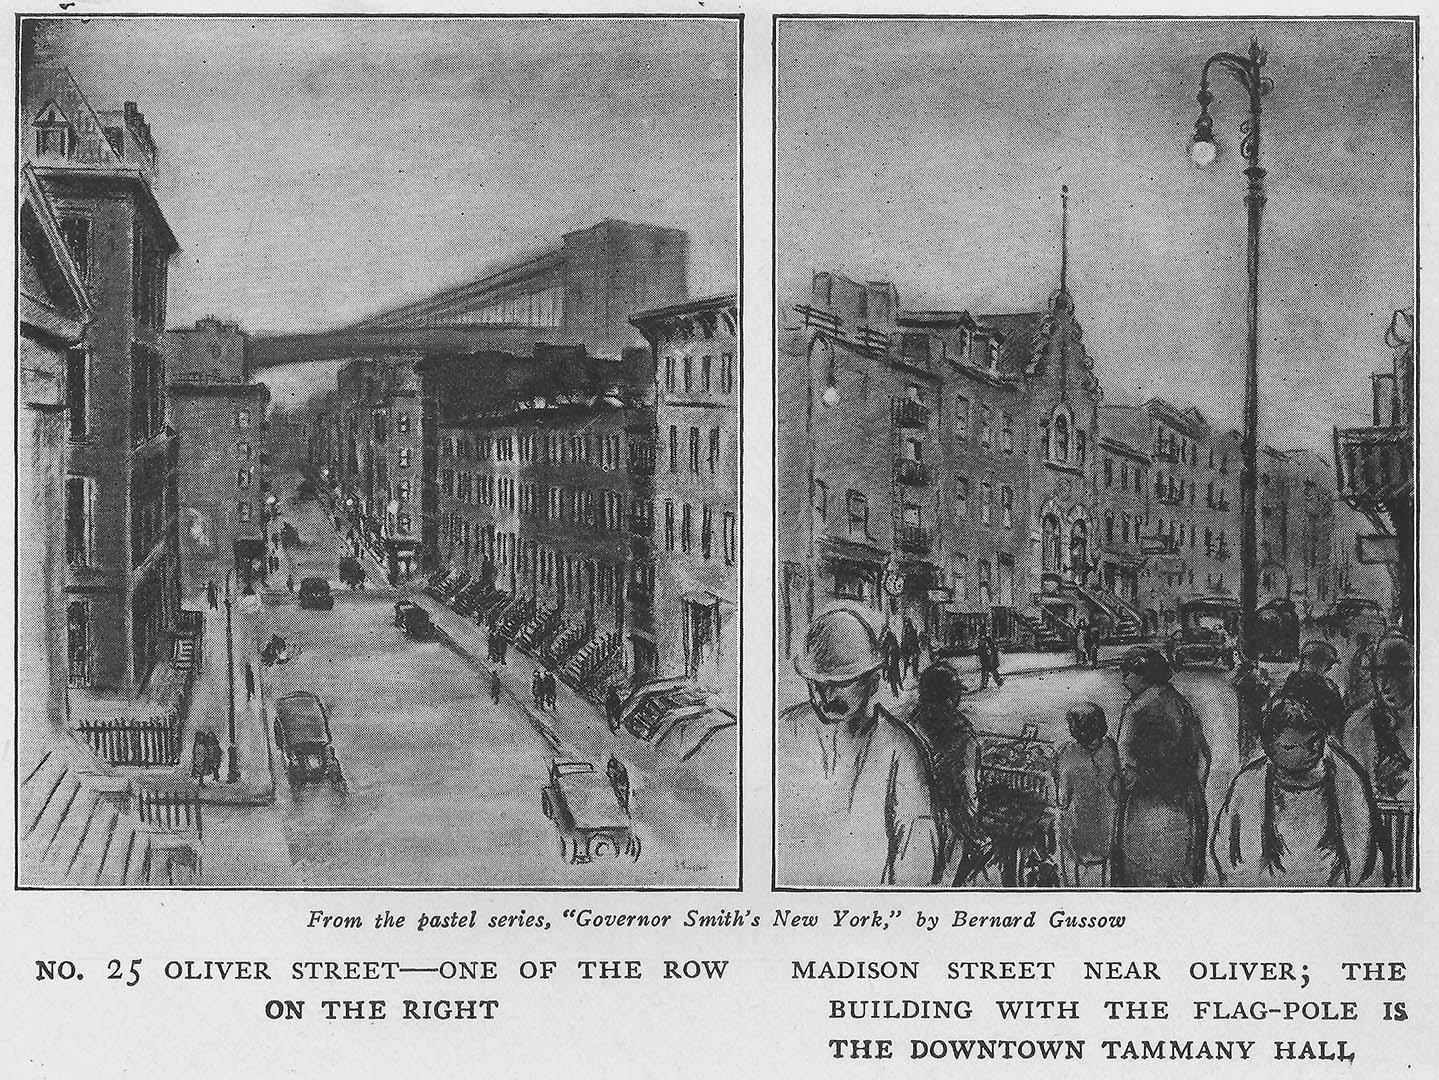 bernard-gussow-governor-smiths-new-york-oliver-street-madison-tammany.jpg